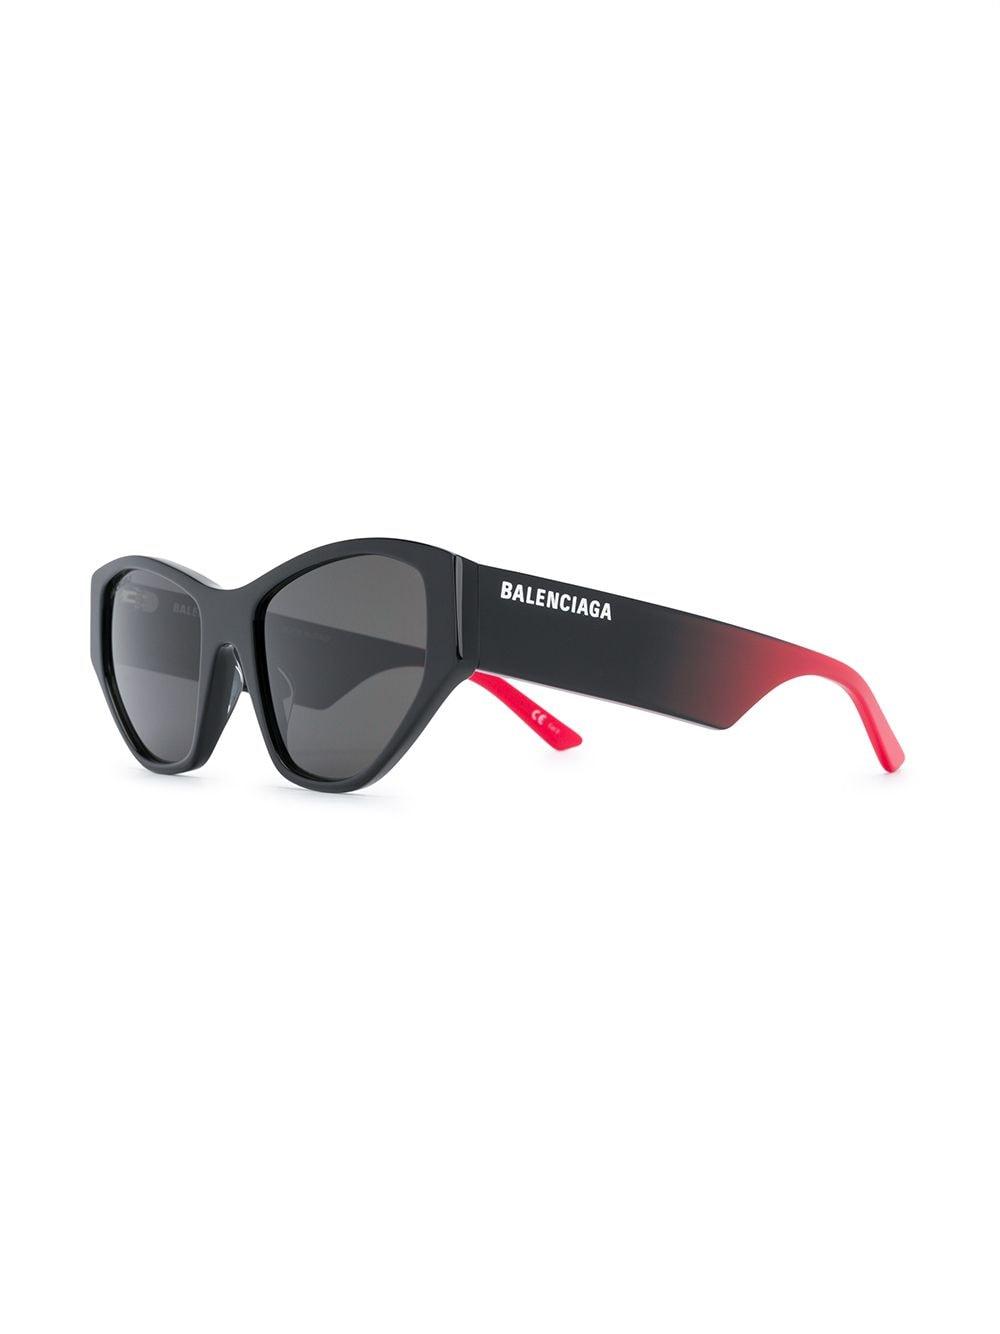 Picture of Balenciaga   Contrast Cat Sunglasses